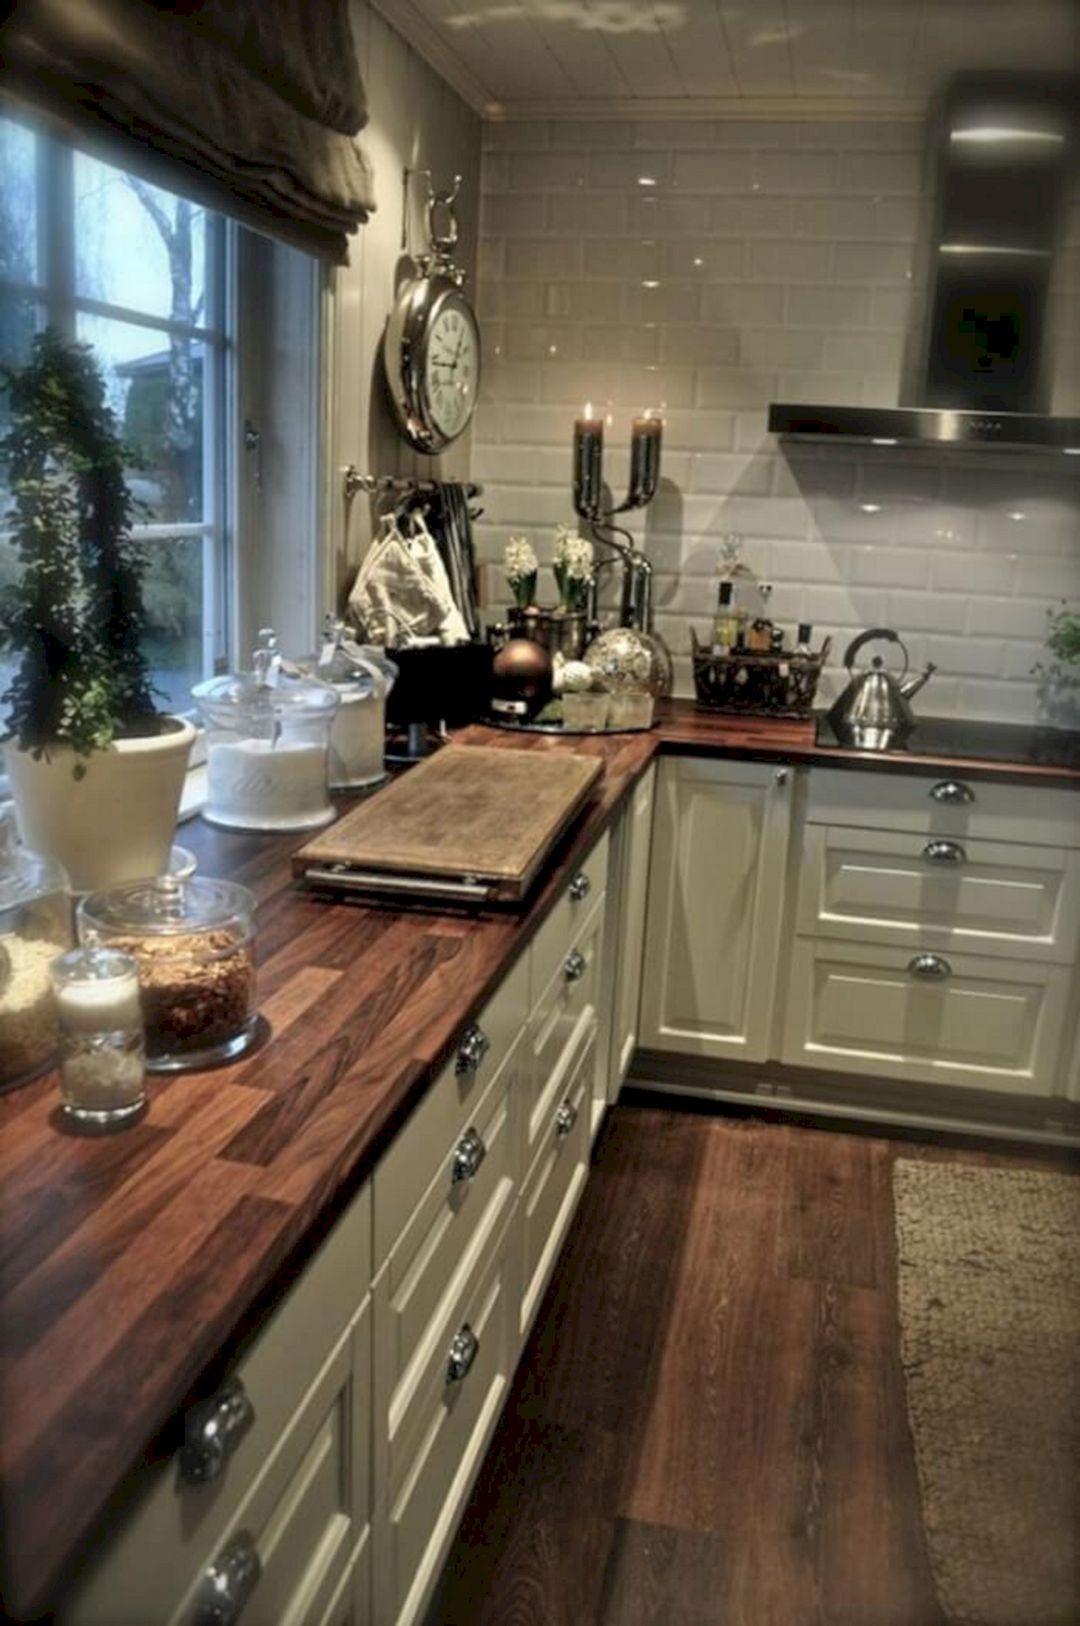 20 Farmhouse Kitchen Ideas on a Budget for 2018